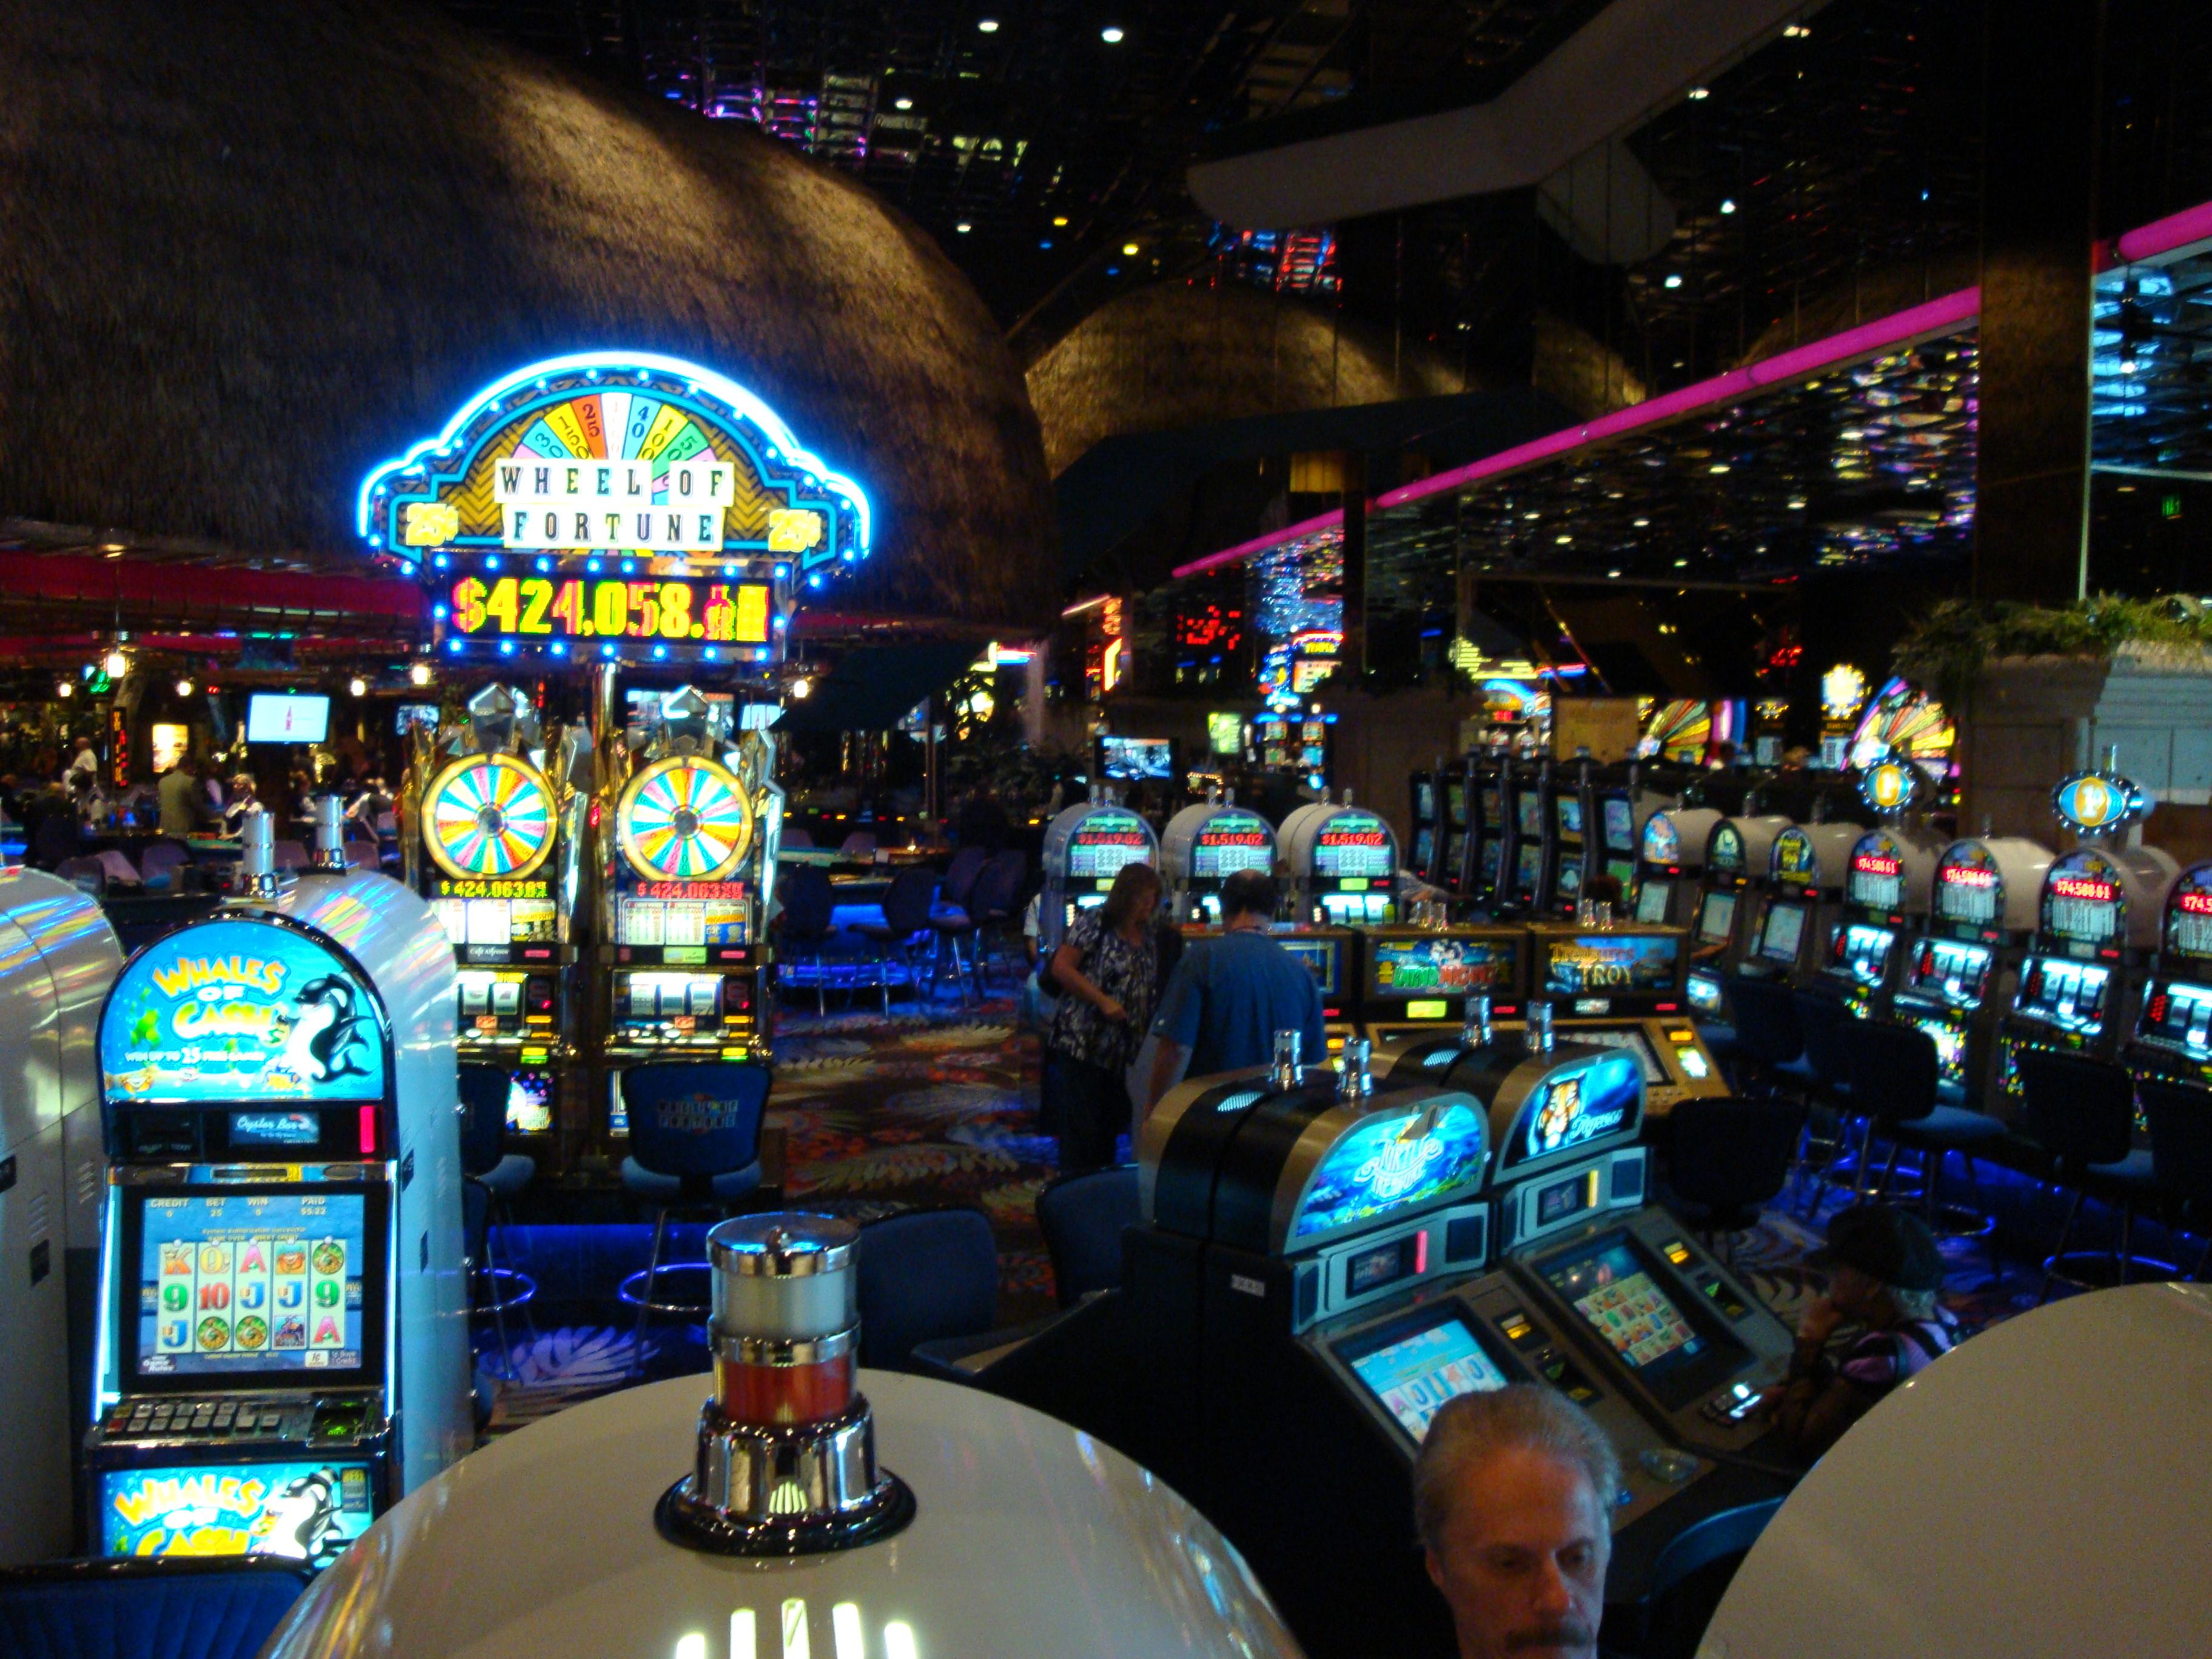 Free planet 7 casino codes